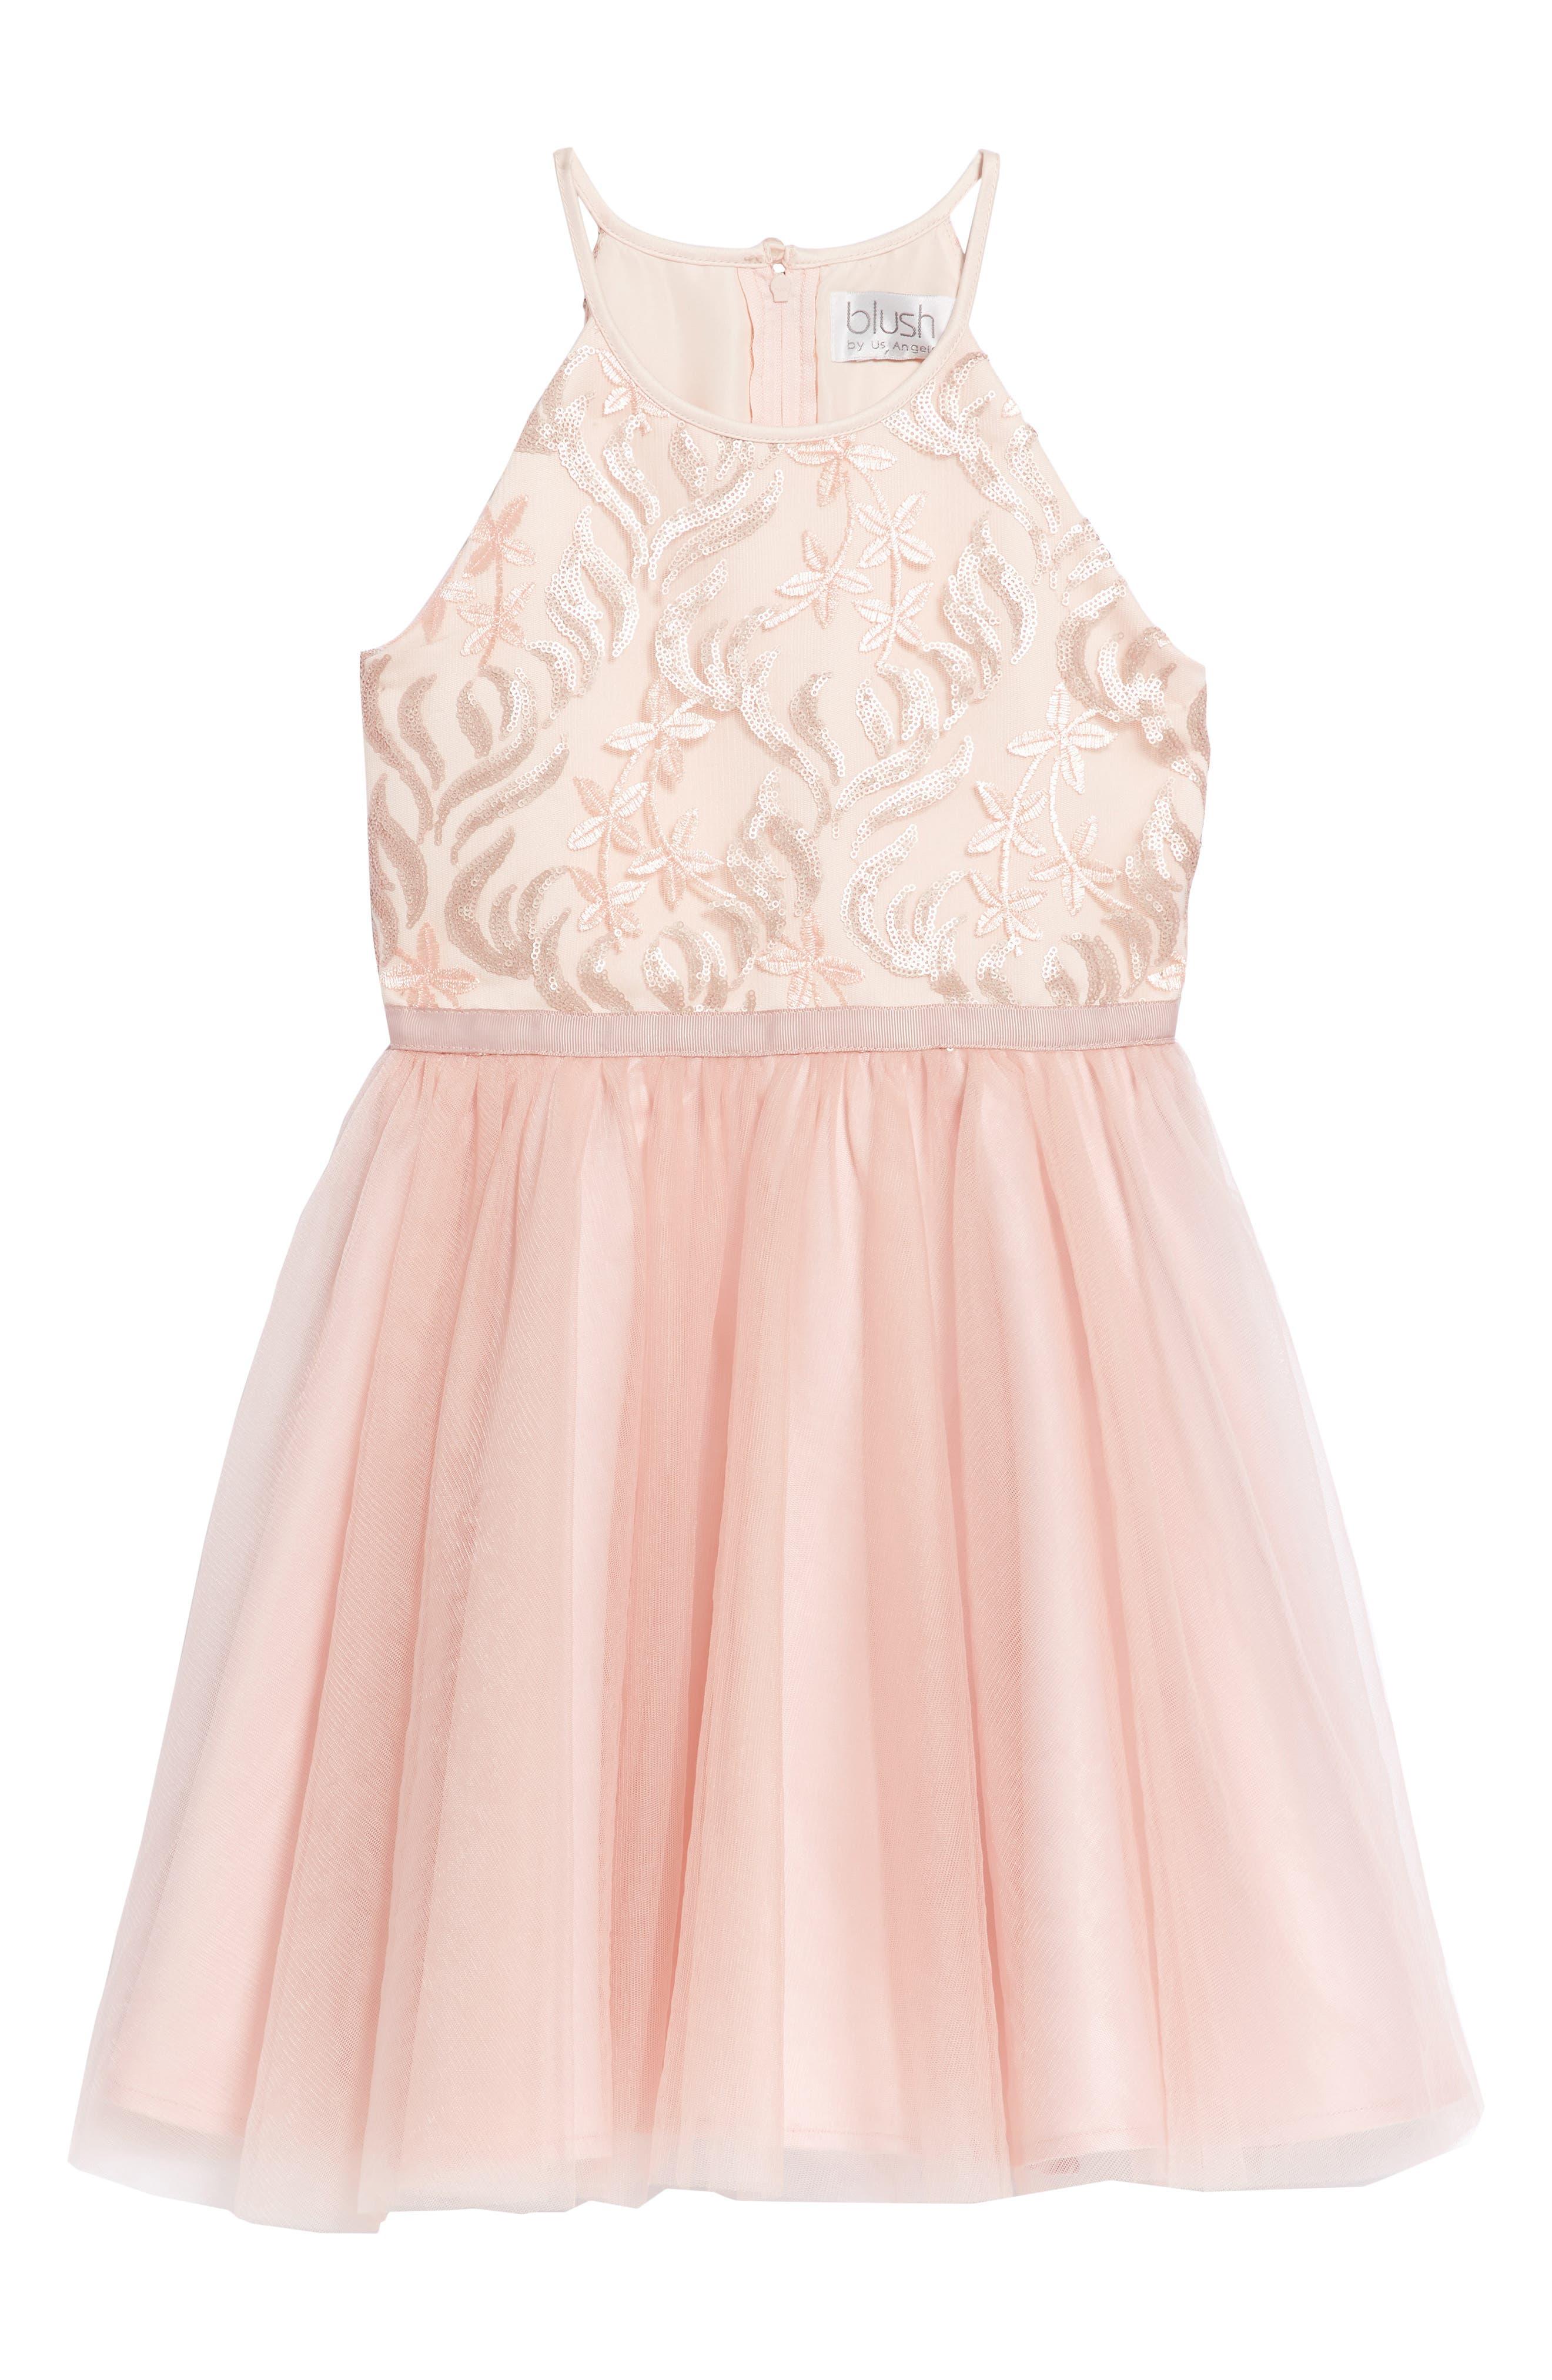 Sequin Tutu Dress,                         Main,                         color, 685